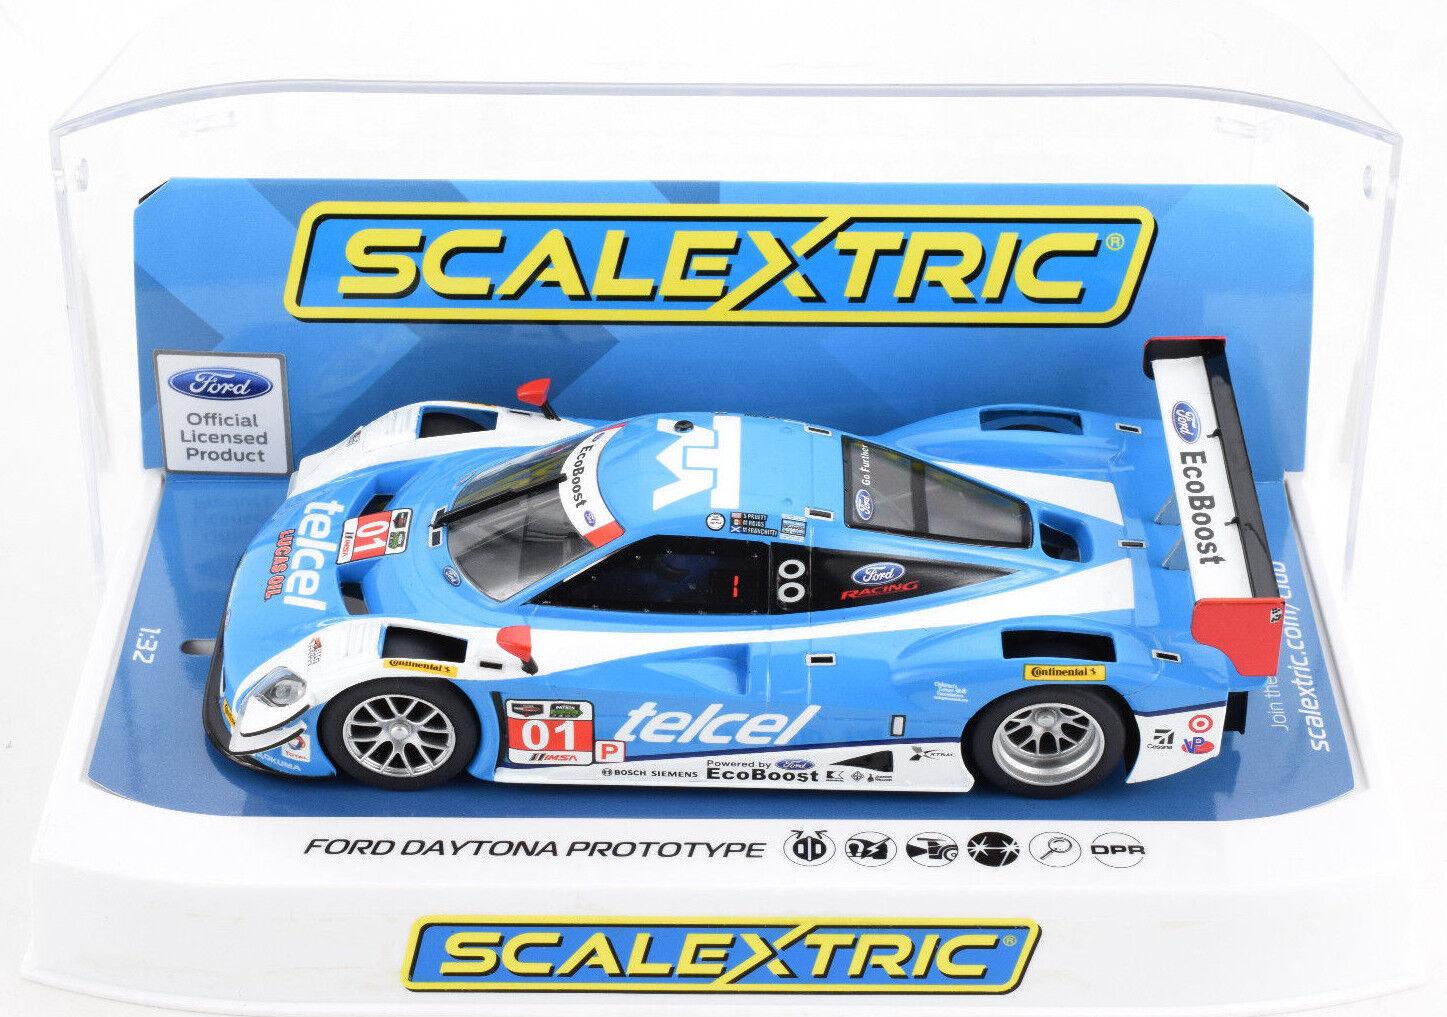 Scalextric  Telcel  Ford Daytona Predotype DPR W  Lights 1 32 Slot Car C3948